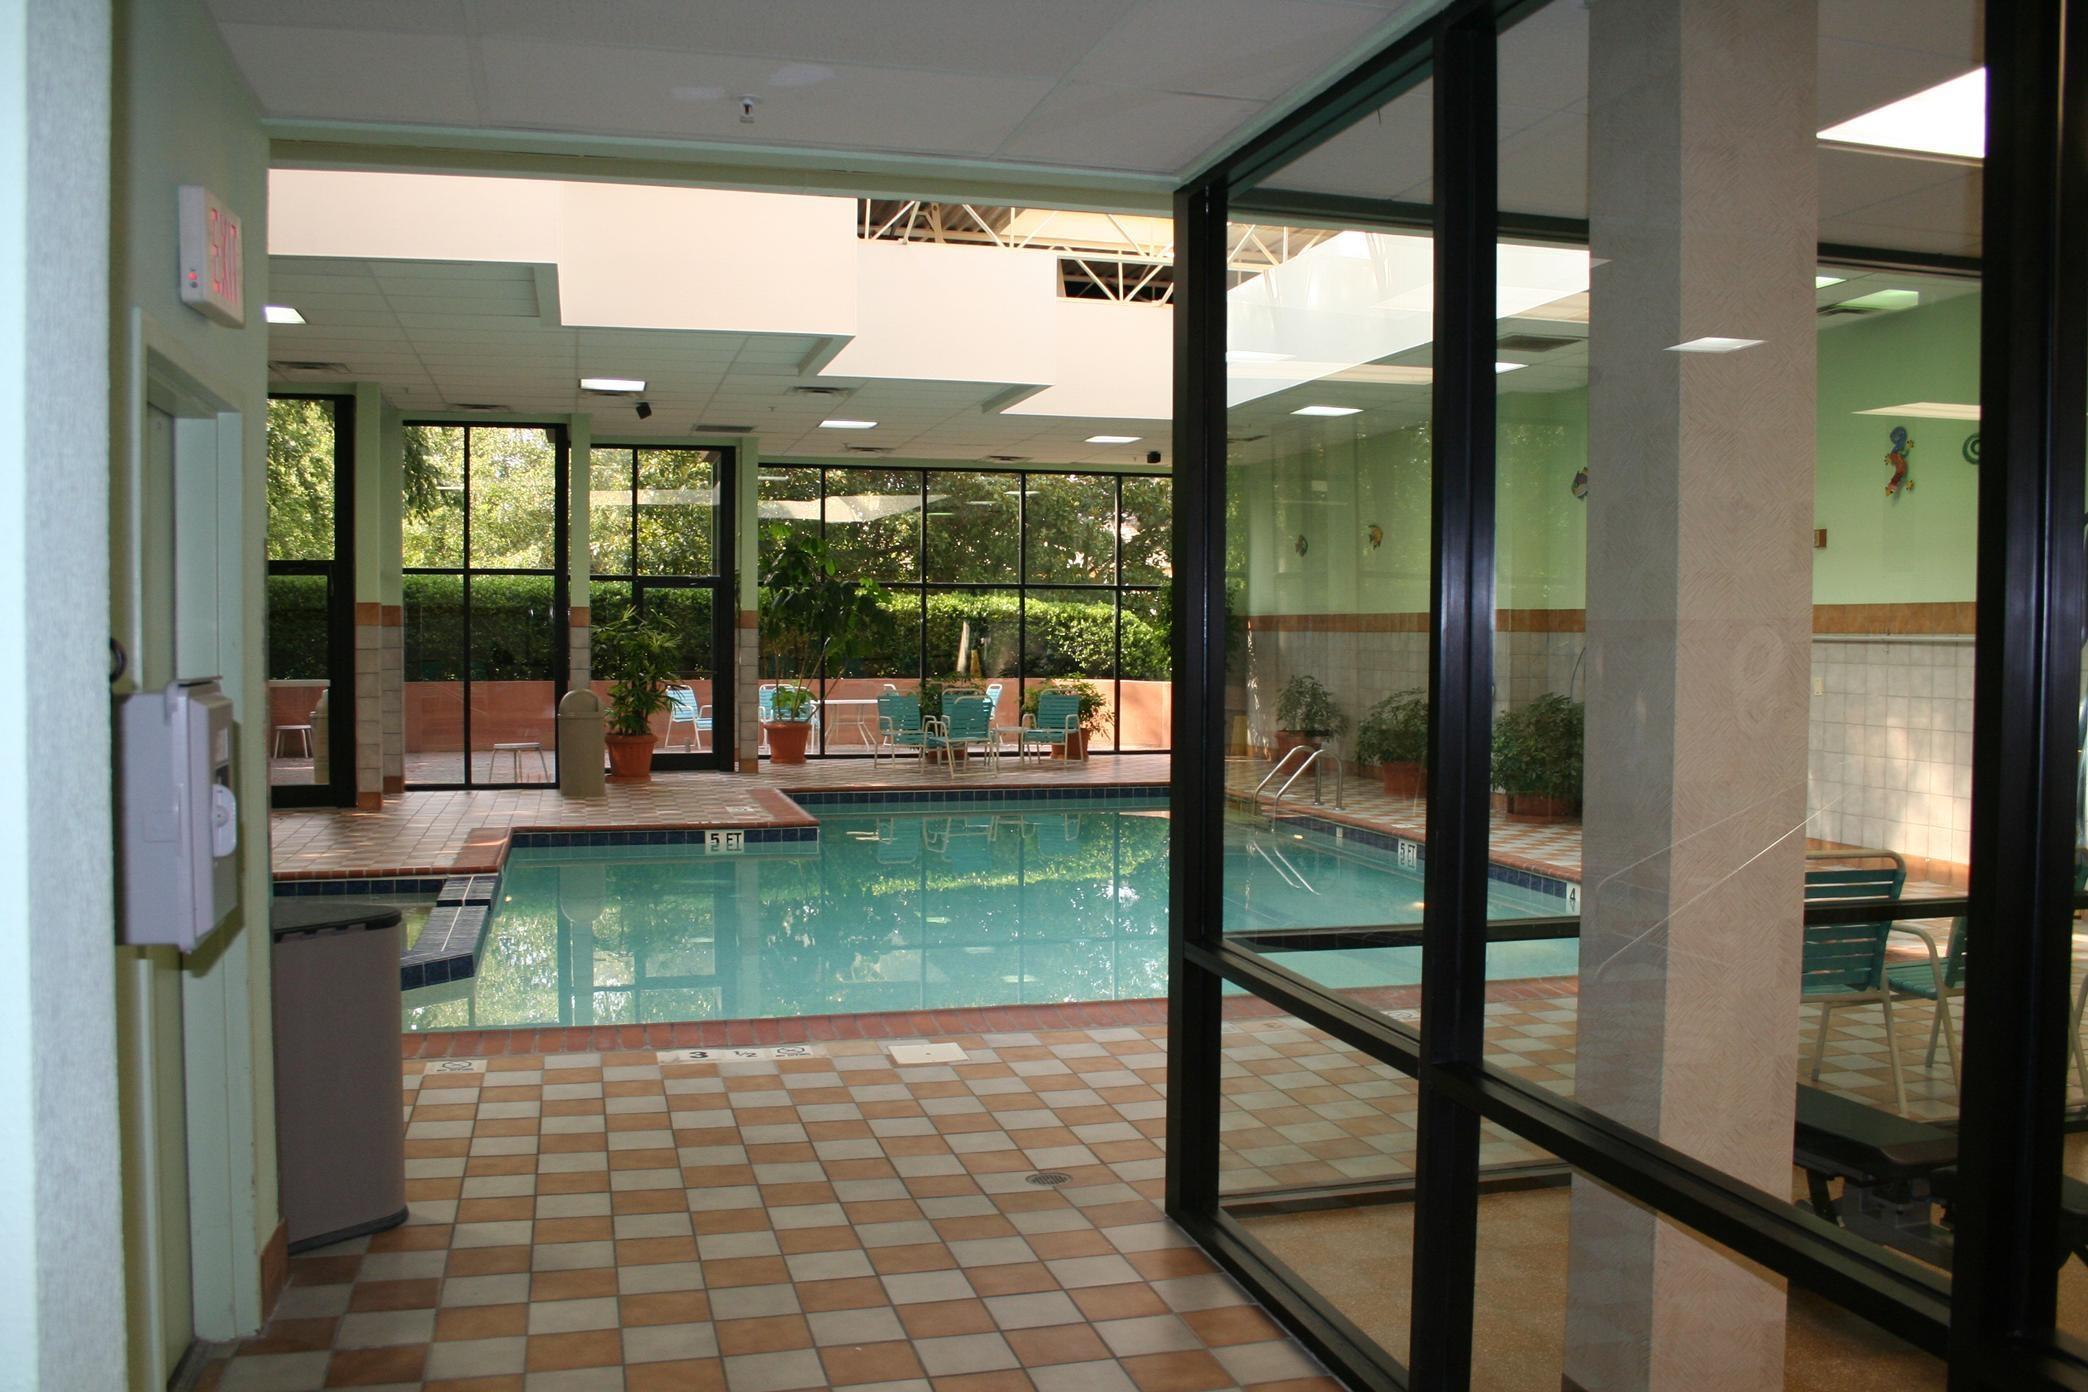 Embassy Suites by Hilton Atlanta Perimeter Center image 2